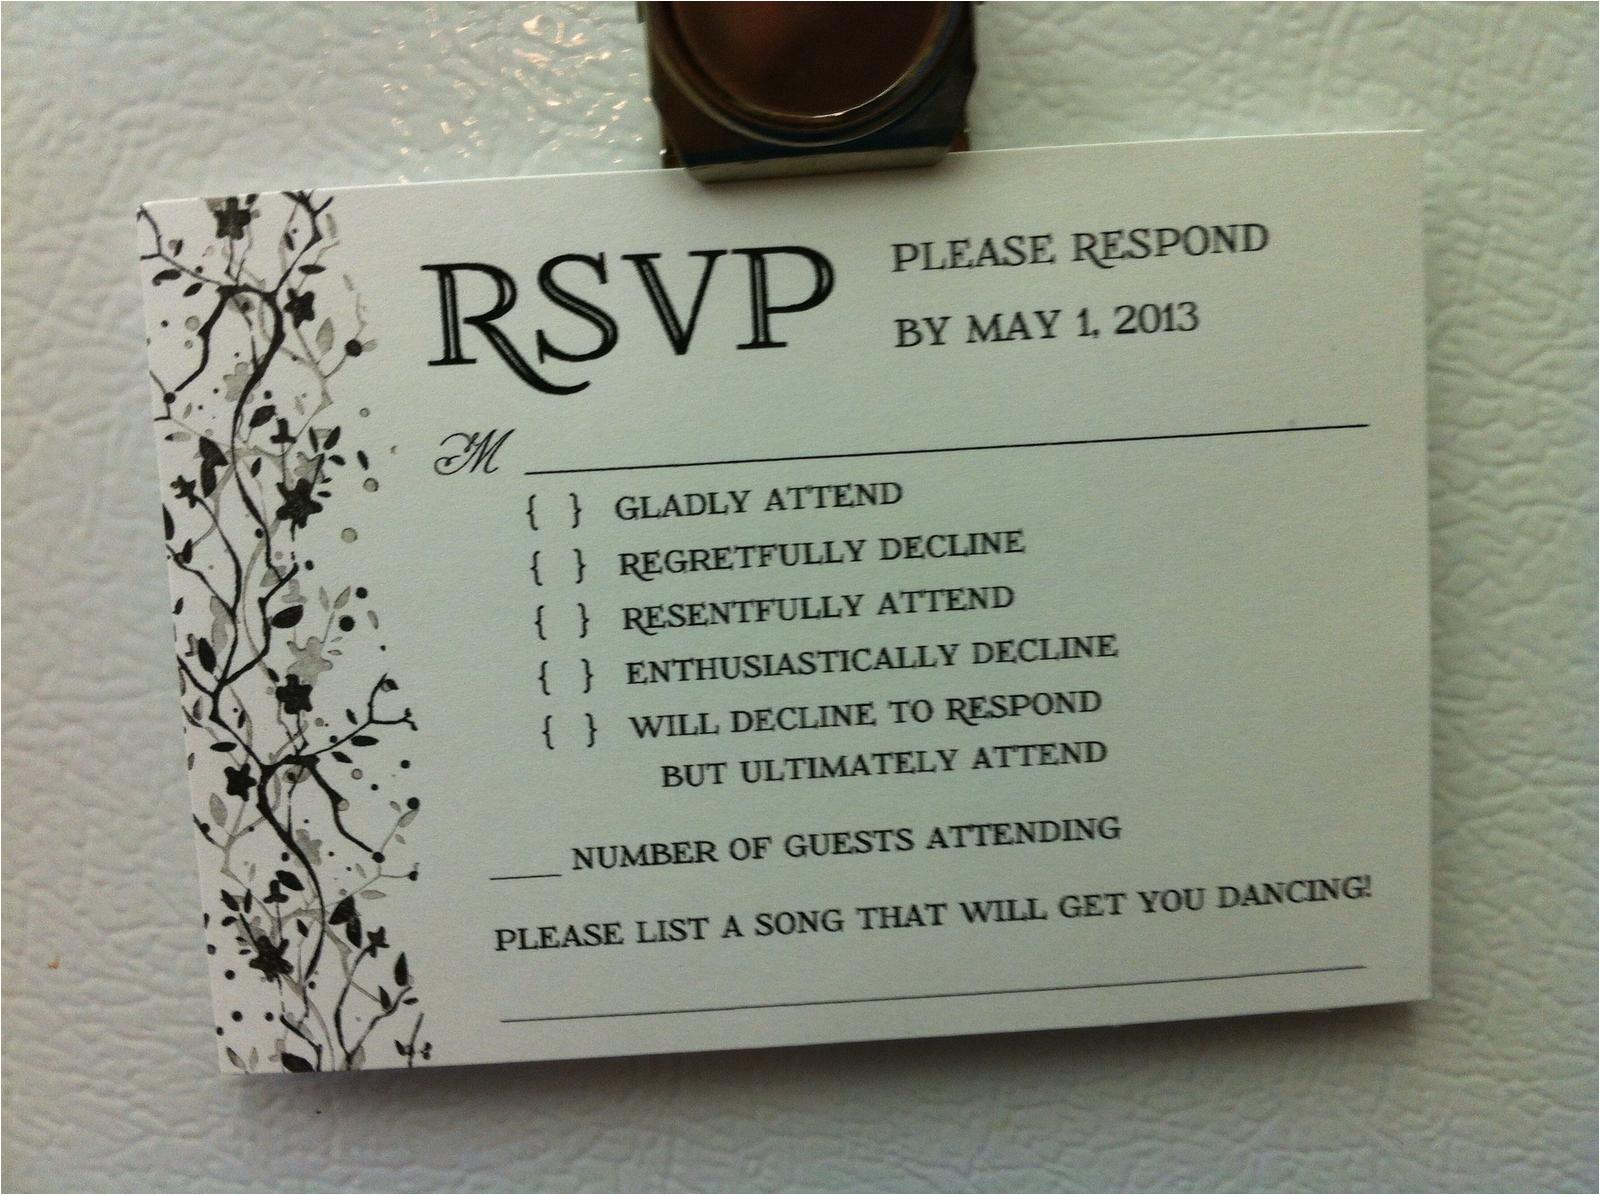 Rsvp Card Wording for Wedding Funny Rsvp Card Love the song Idea Rsvp Wedding Cards